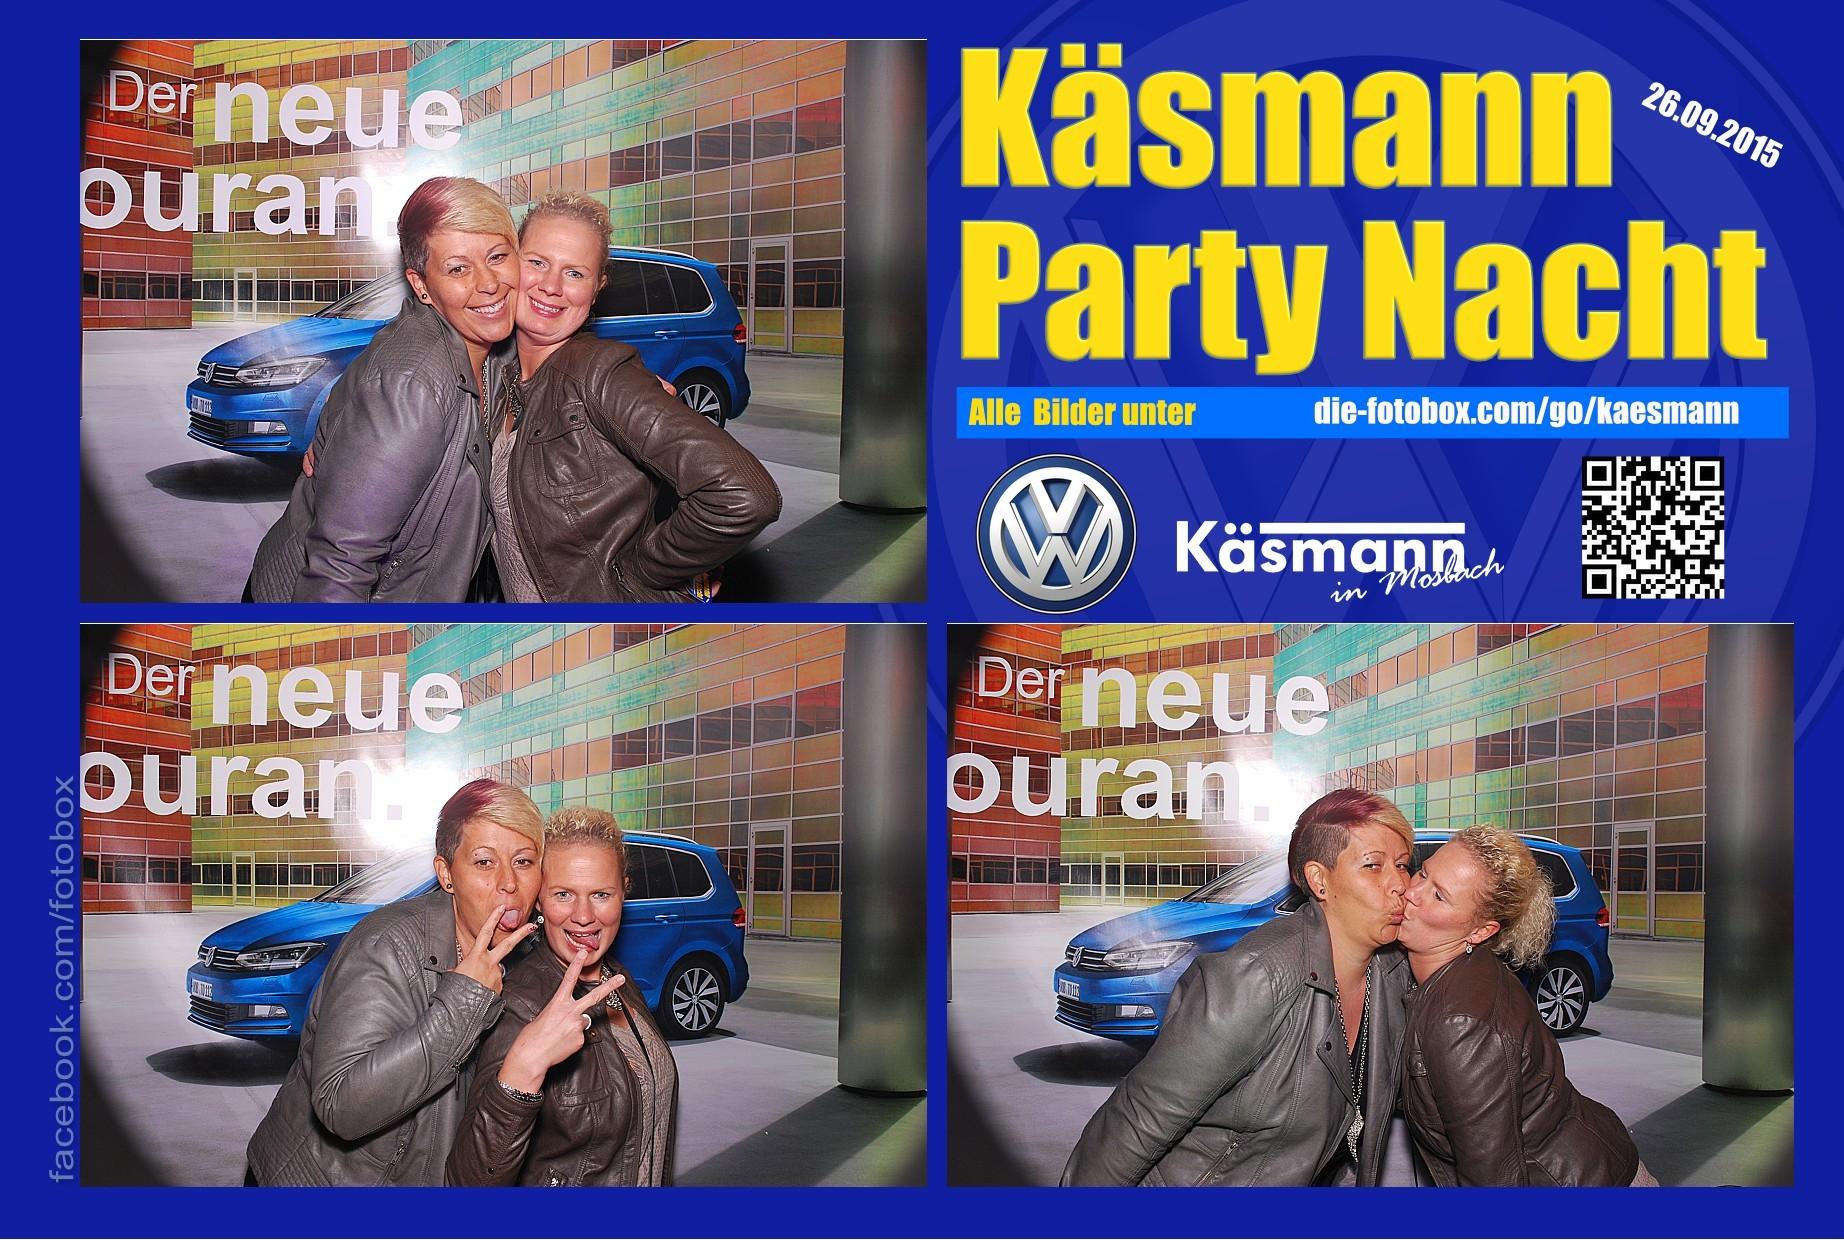 Käsmannparty 2015 - www.die-fotobox.com 01246